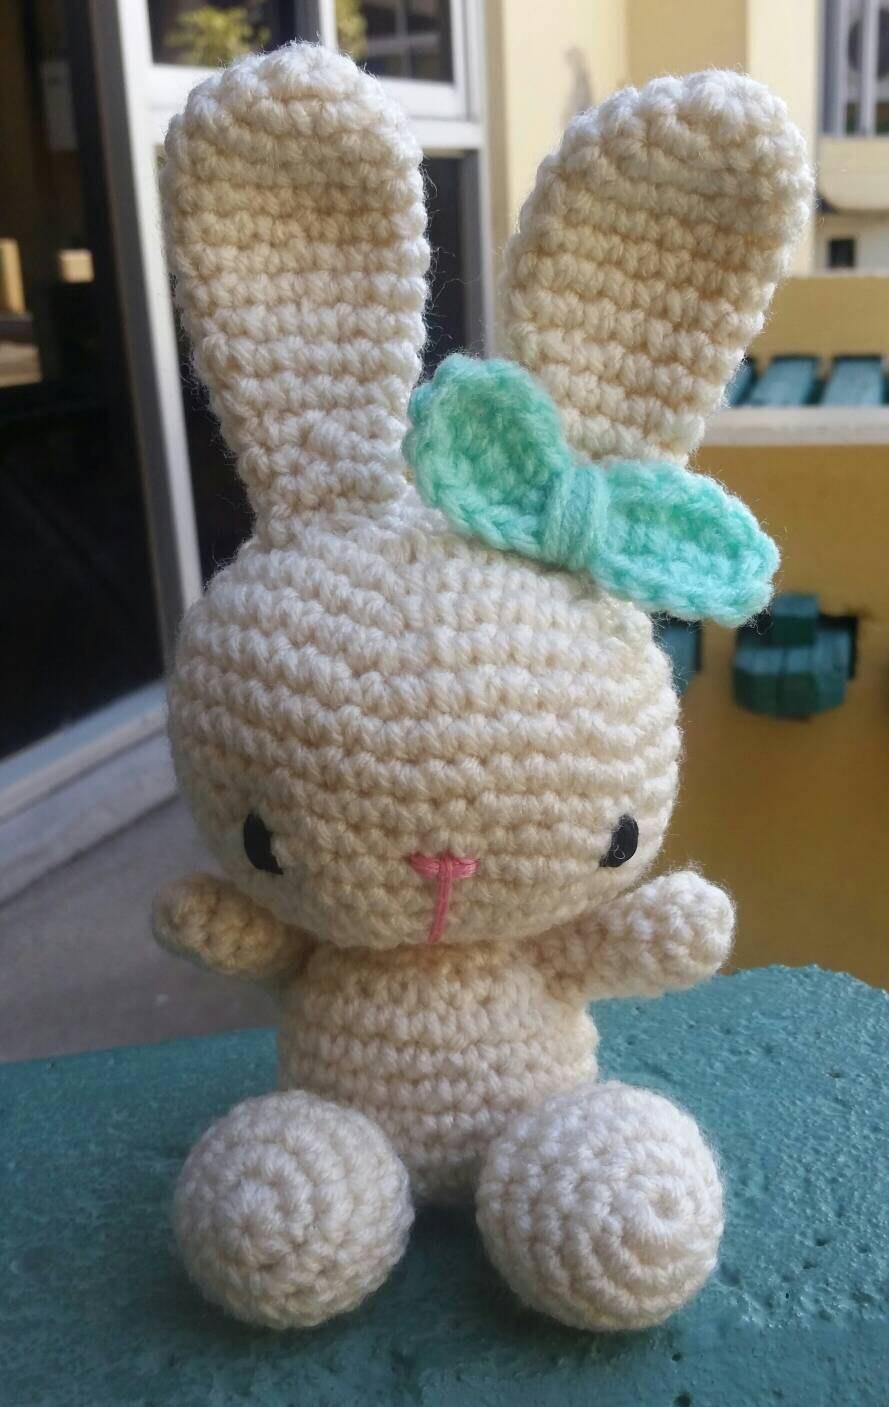 Crochet bunny rabbit. Amigurumi rabbit. Amigurumi toys.